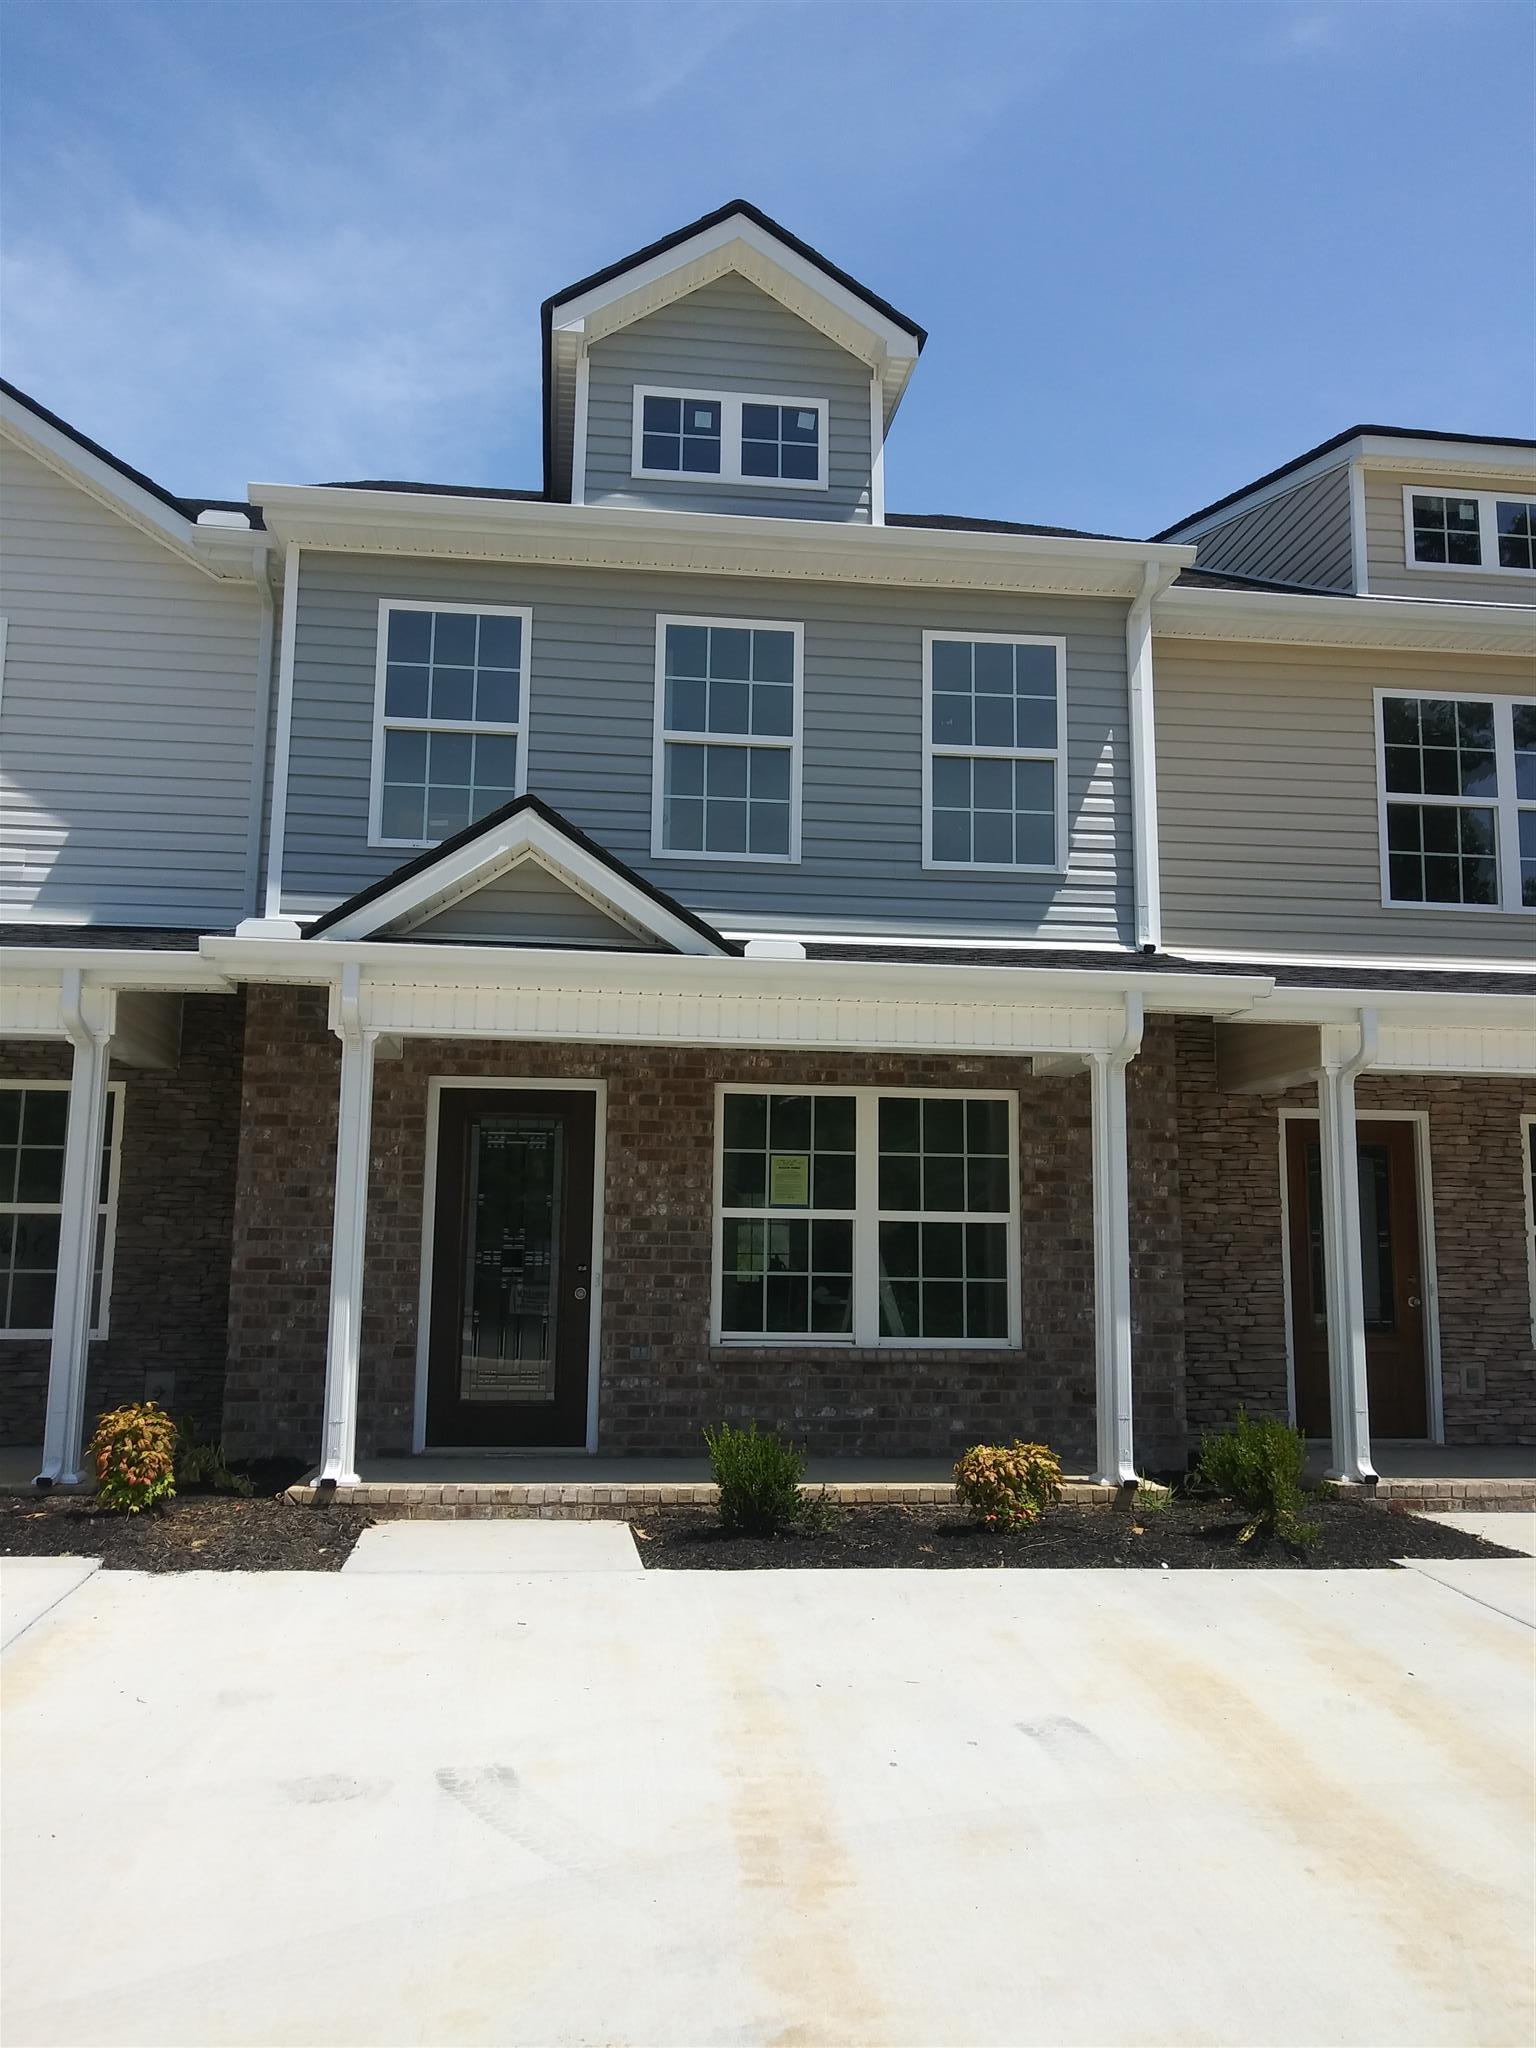 18 Lot 18 Downstream, Ashland City, TN 37015 - Ashland City, TN real estate listing